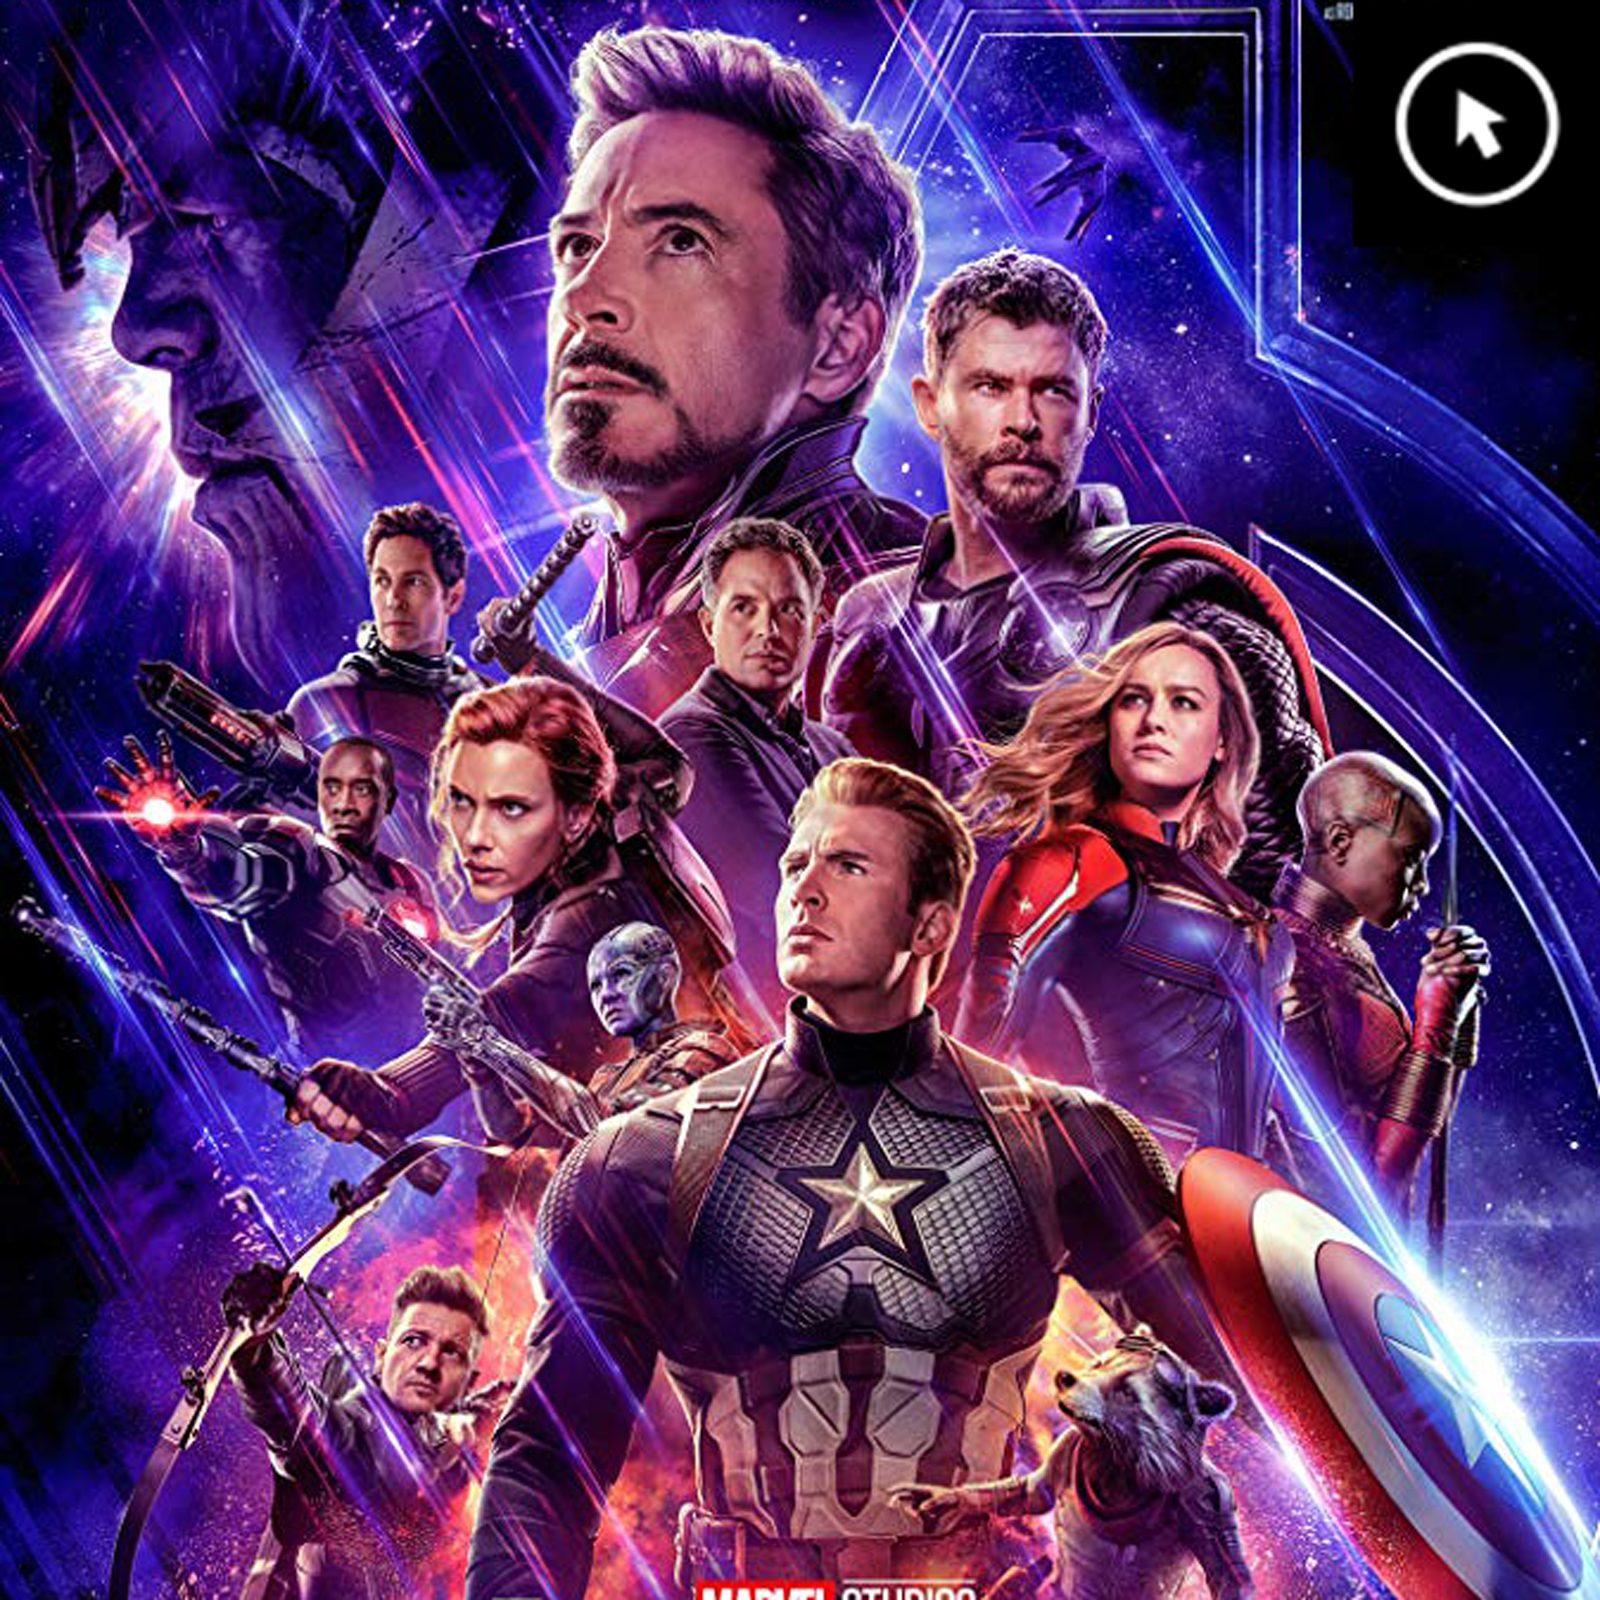 Movie Review: Endgame